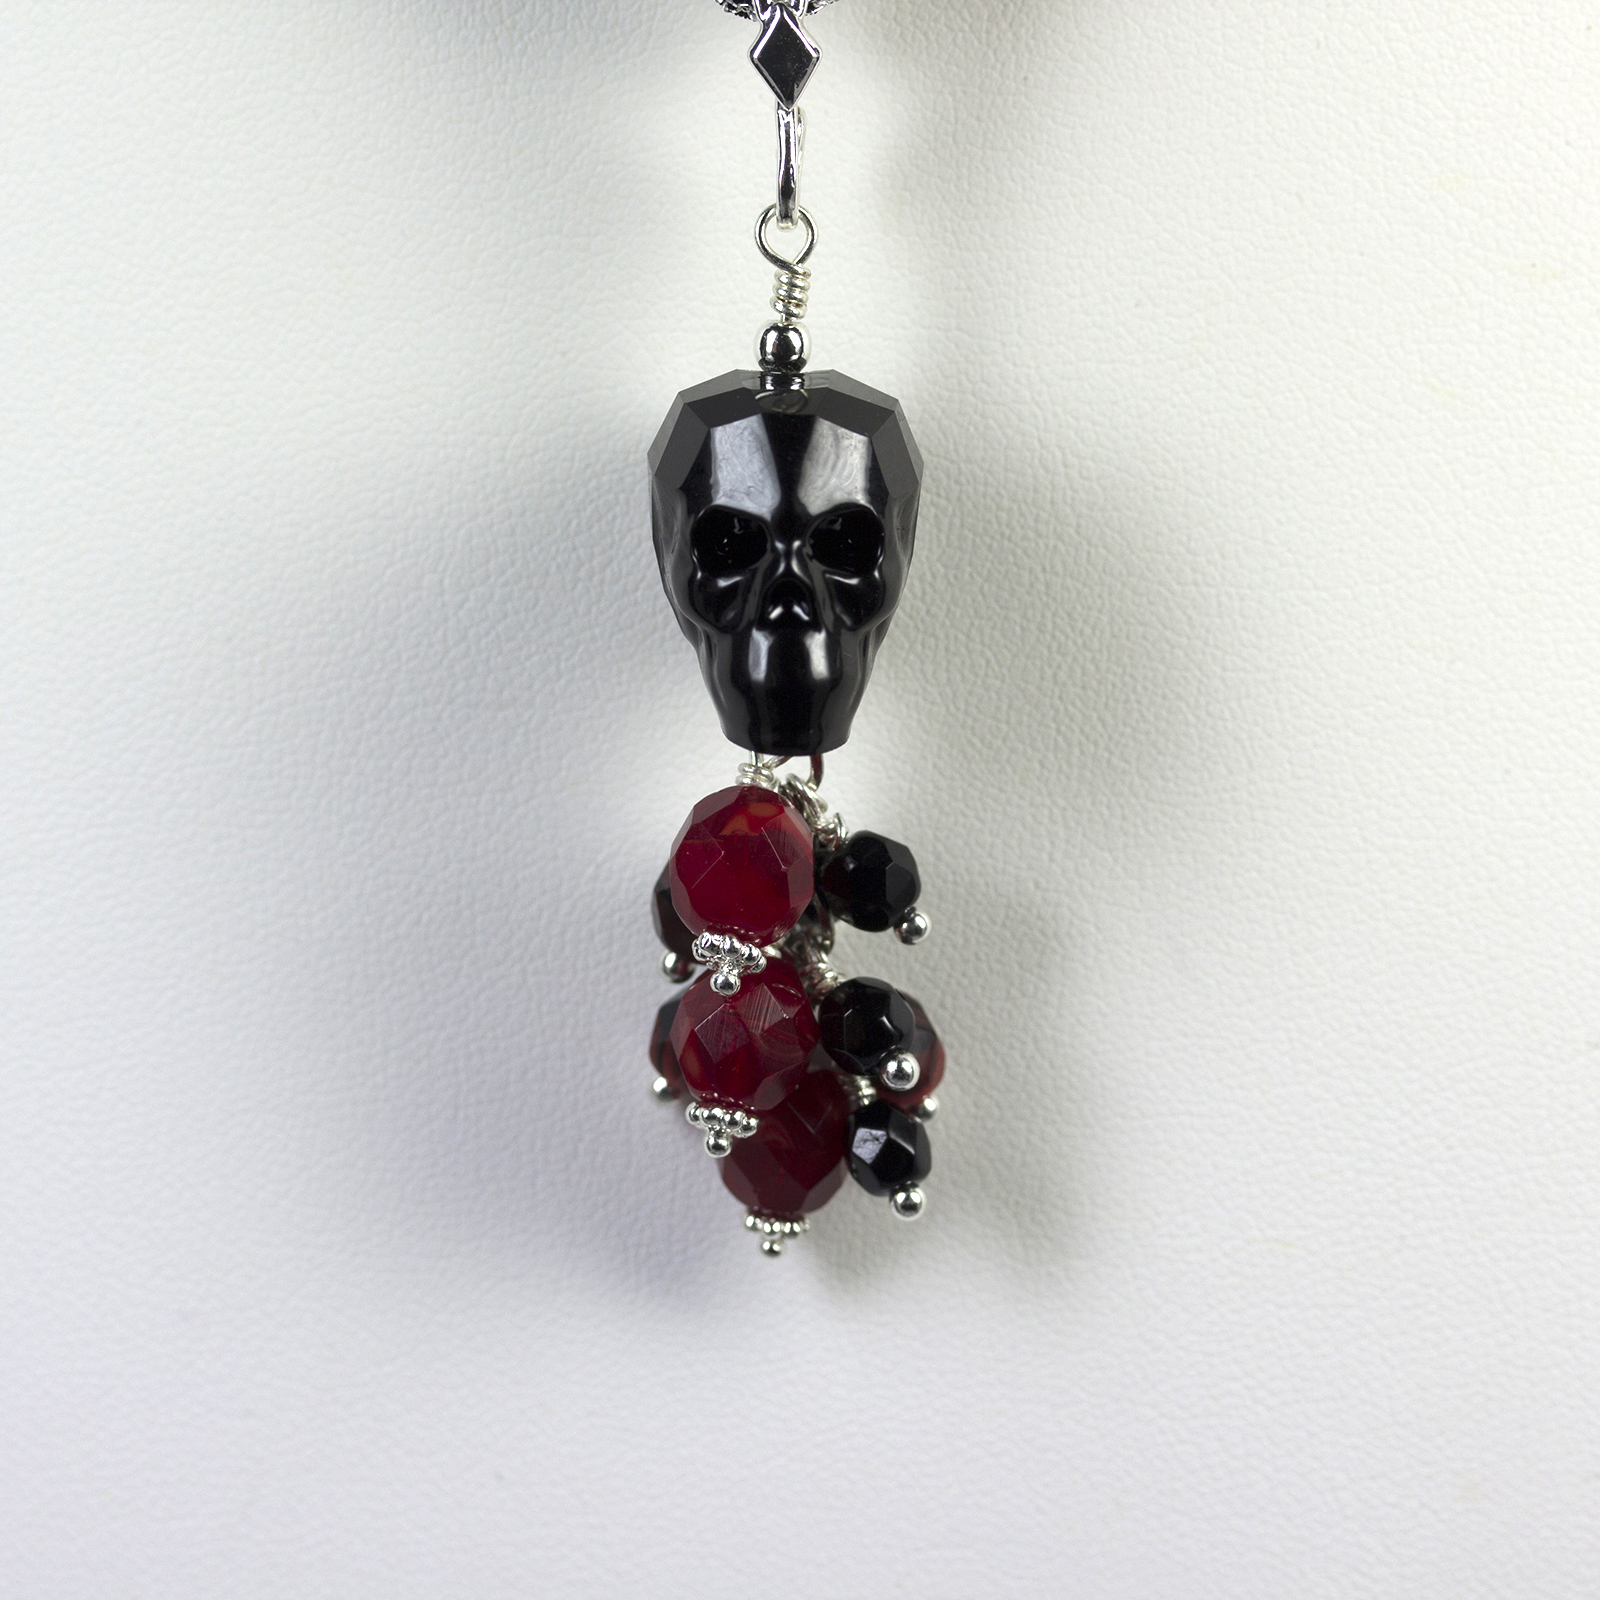 Designer Jewelry - Cinco de Mayo Skull Pendant